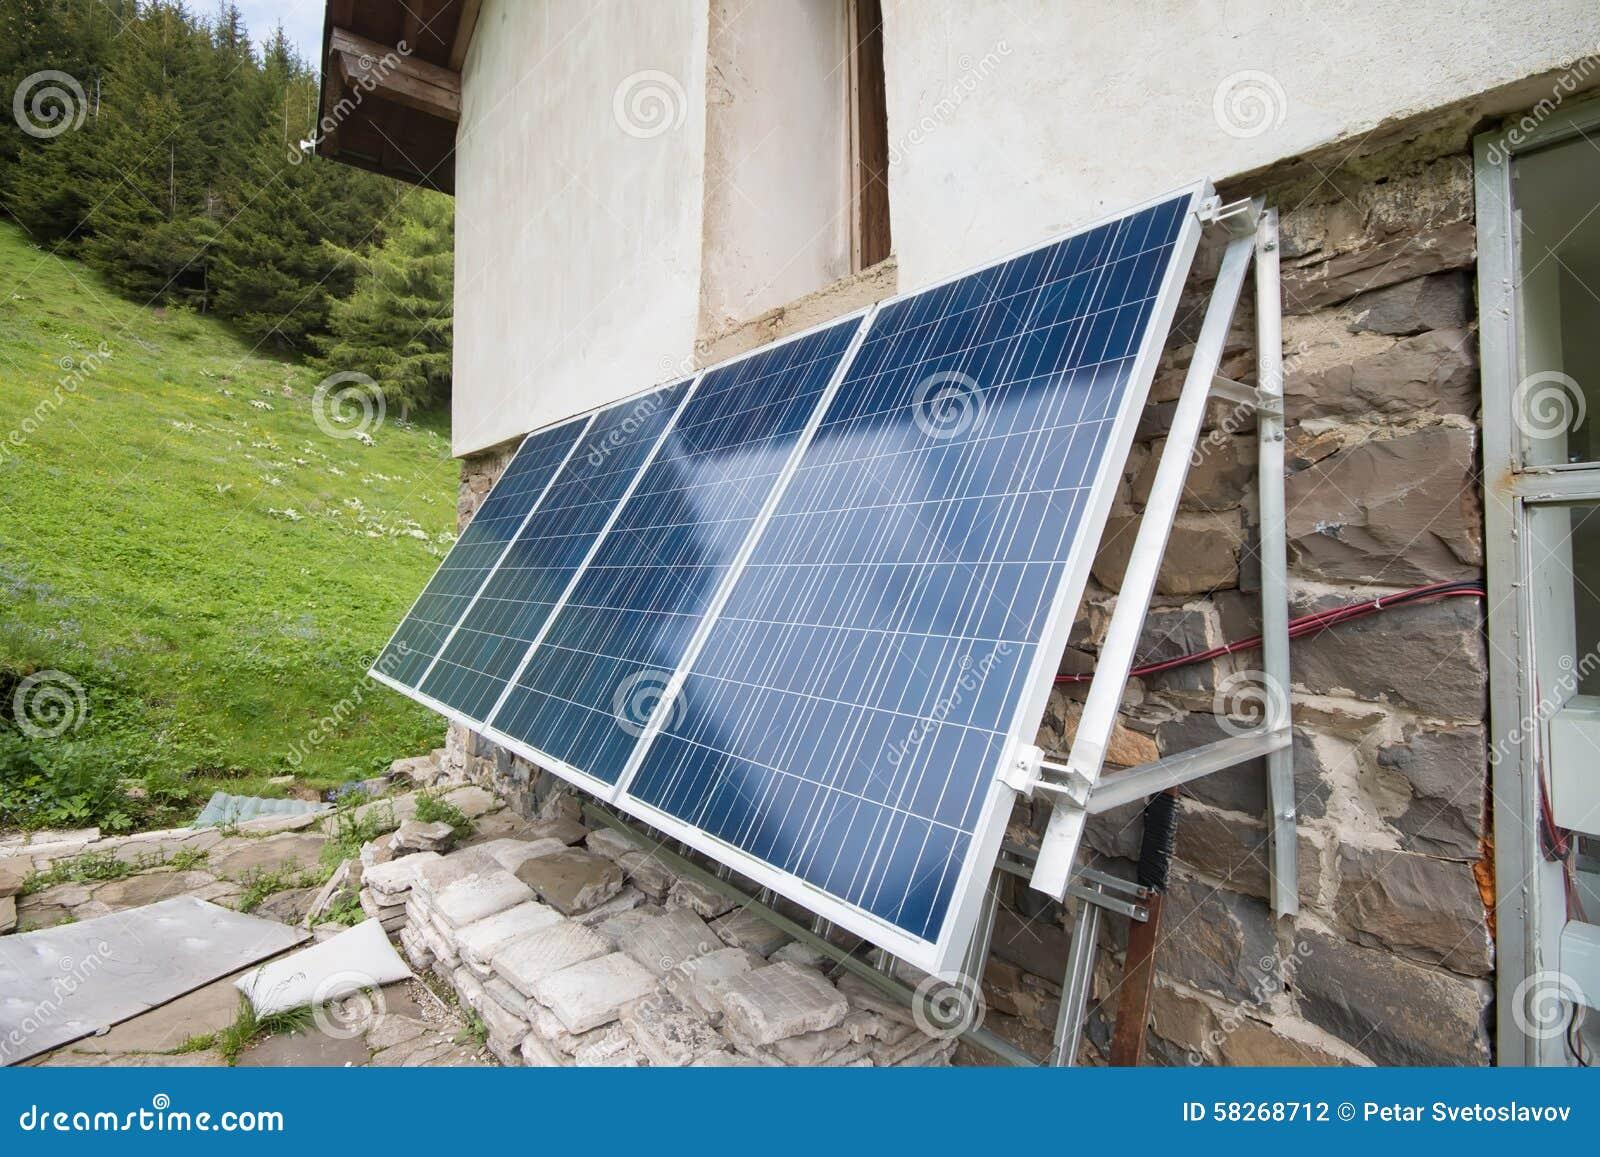 Solar panels on apline hut stock photo  Image of